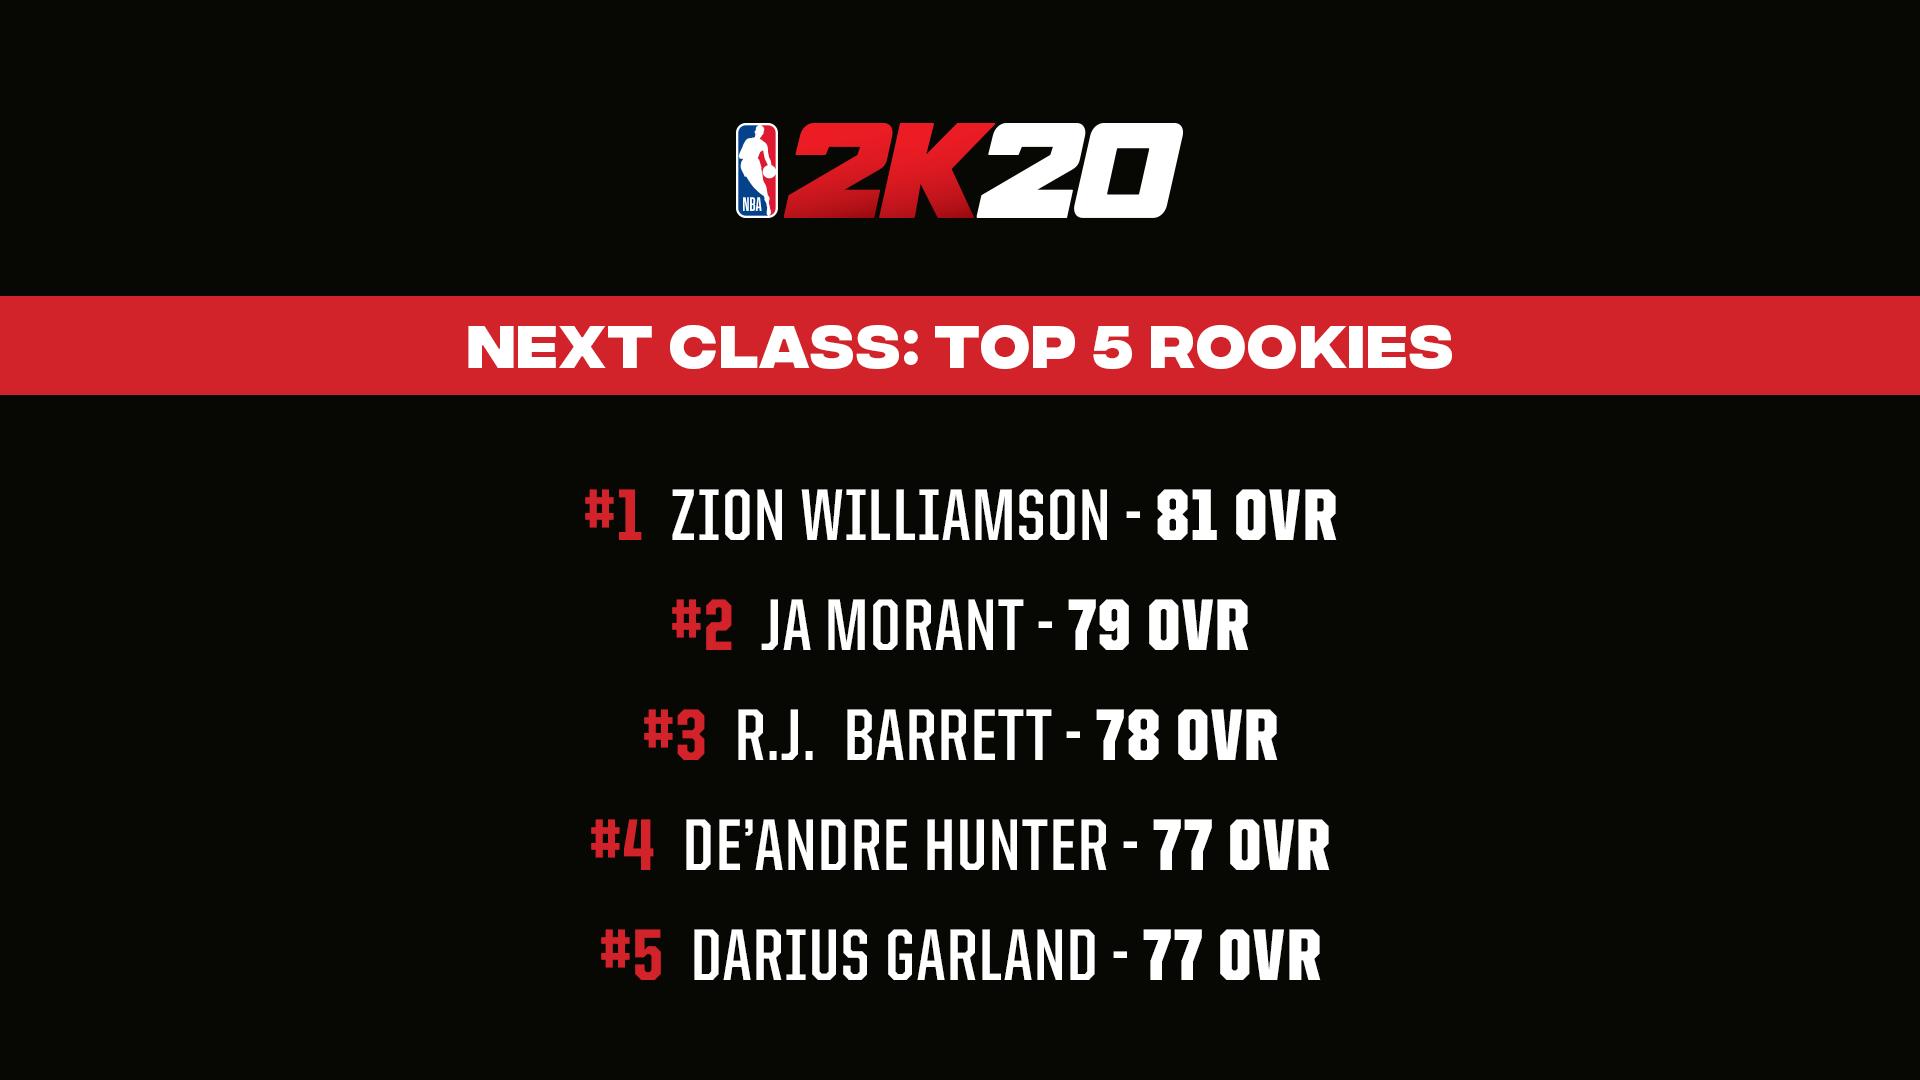 《NBA 2K20》明星球员评分公布!老詹连续10年评分最高 第22张